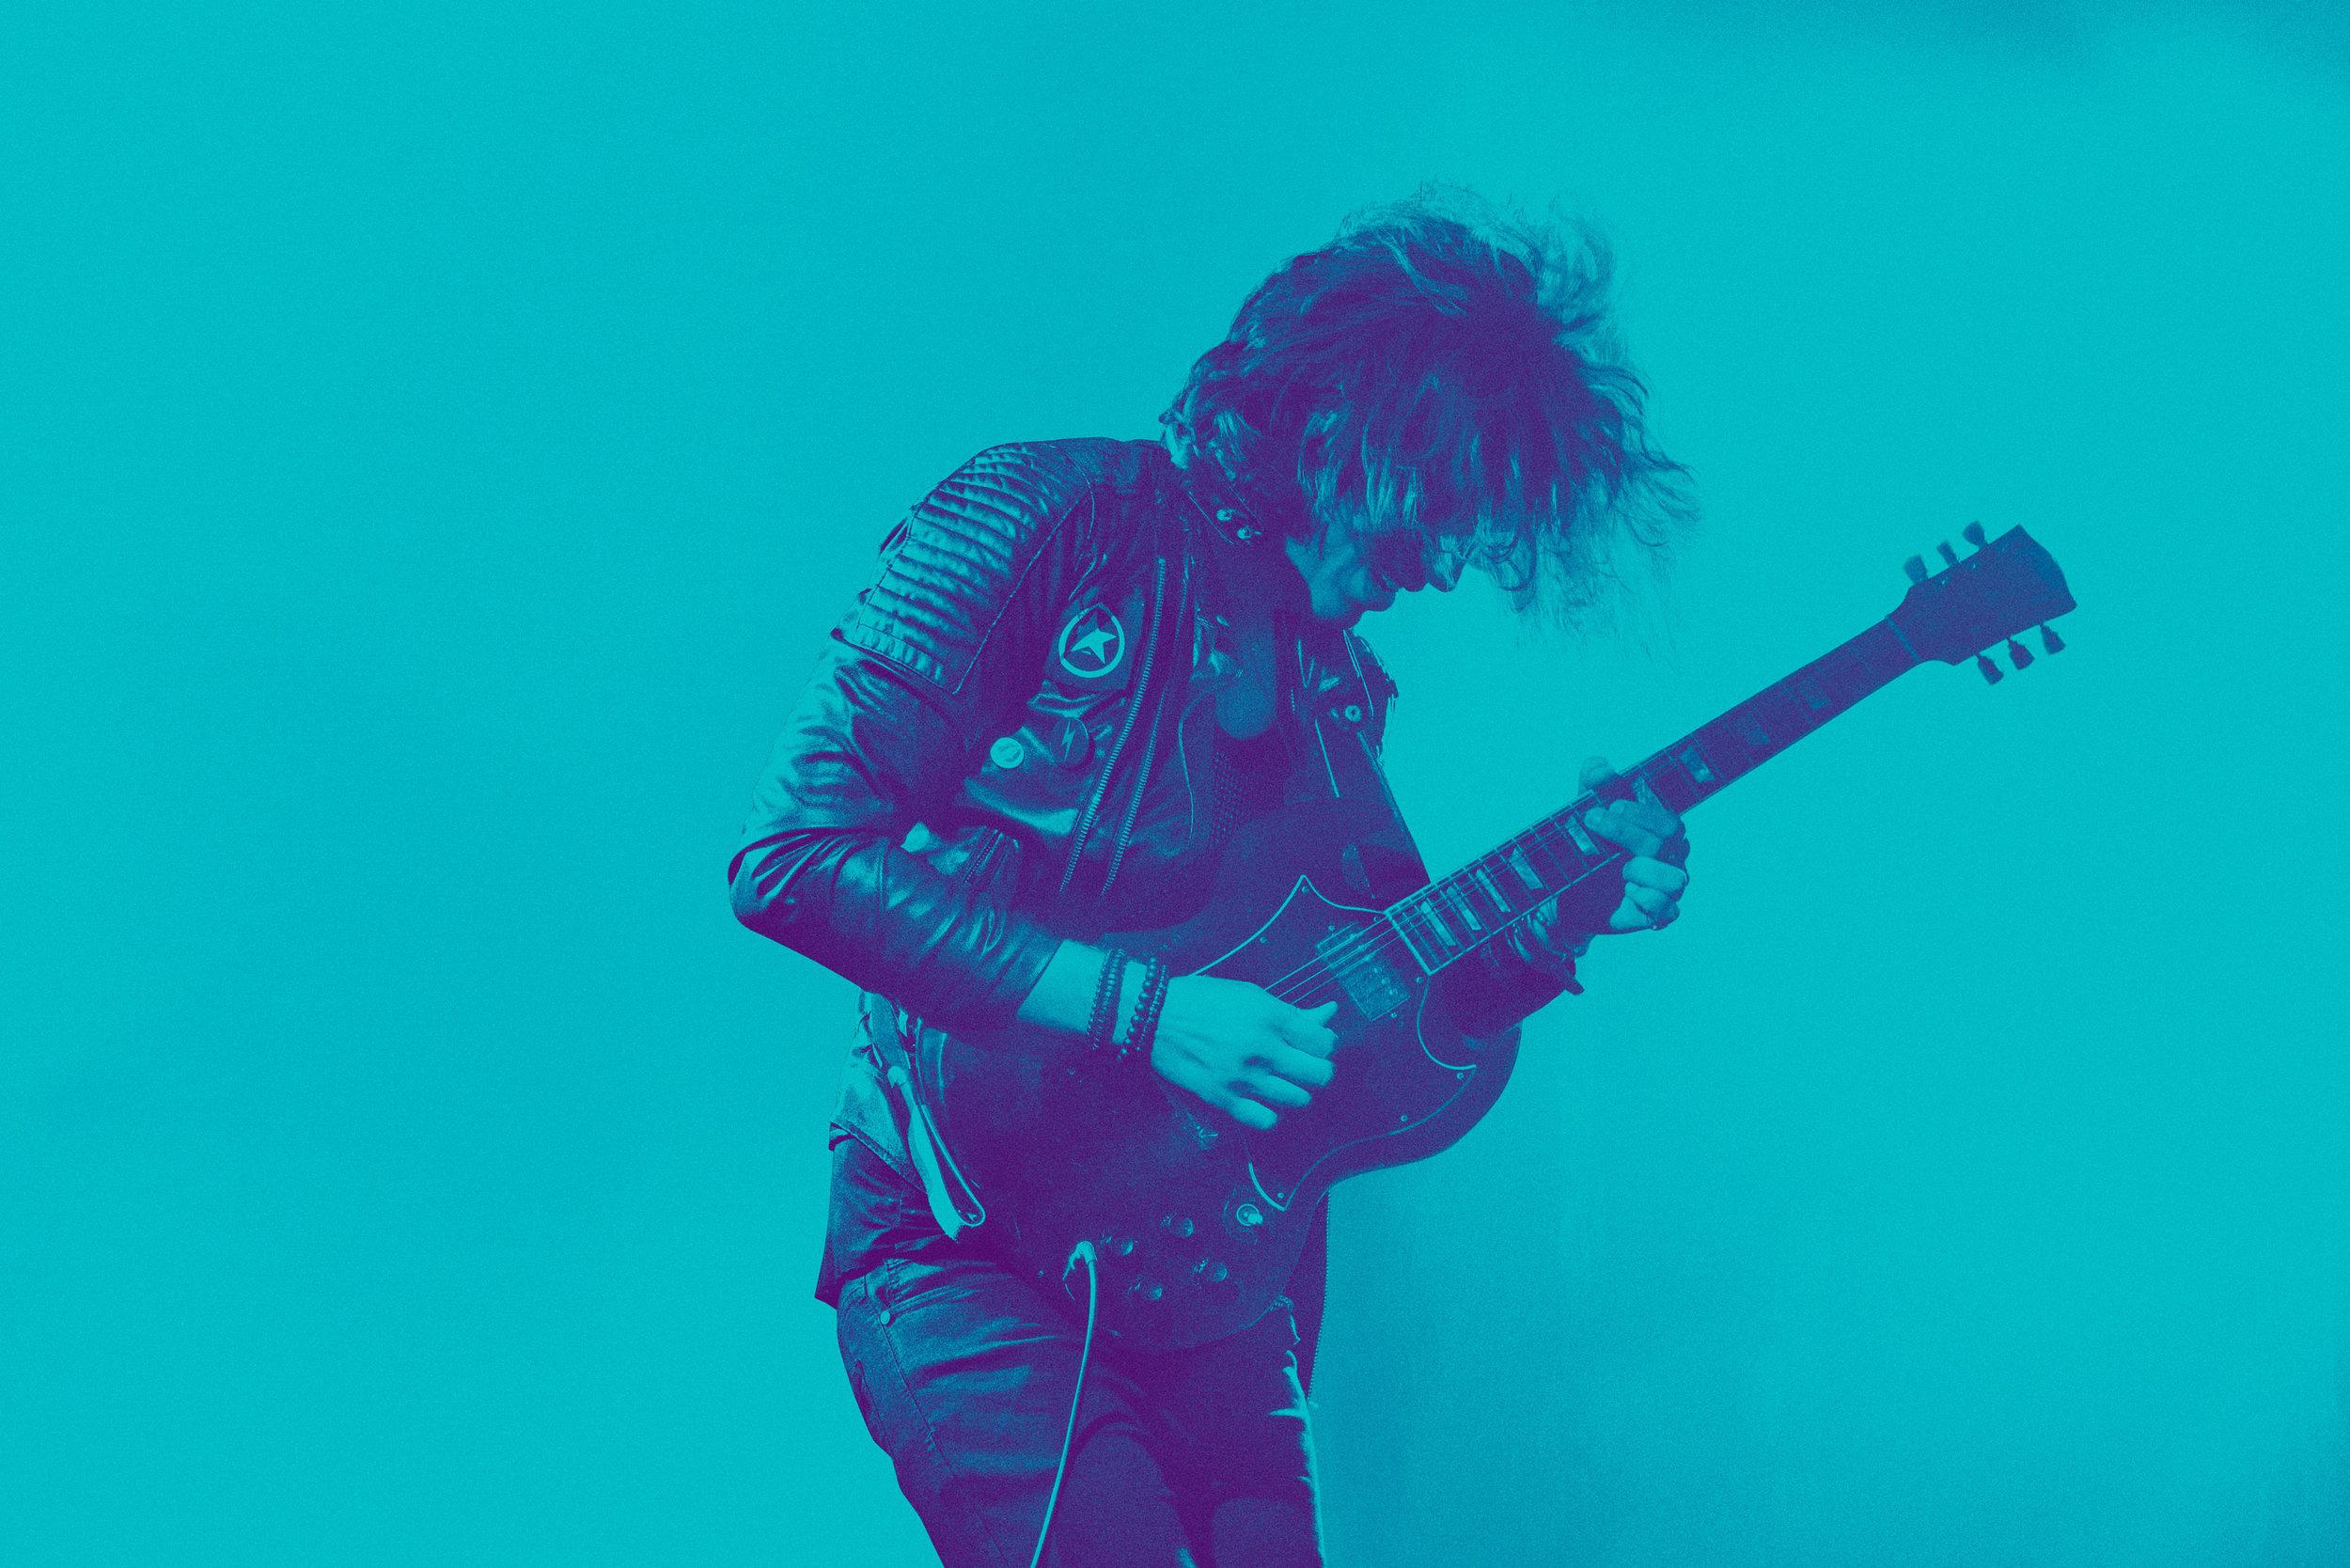 Musicians_Rock_Axia_18412_C2.jpg